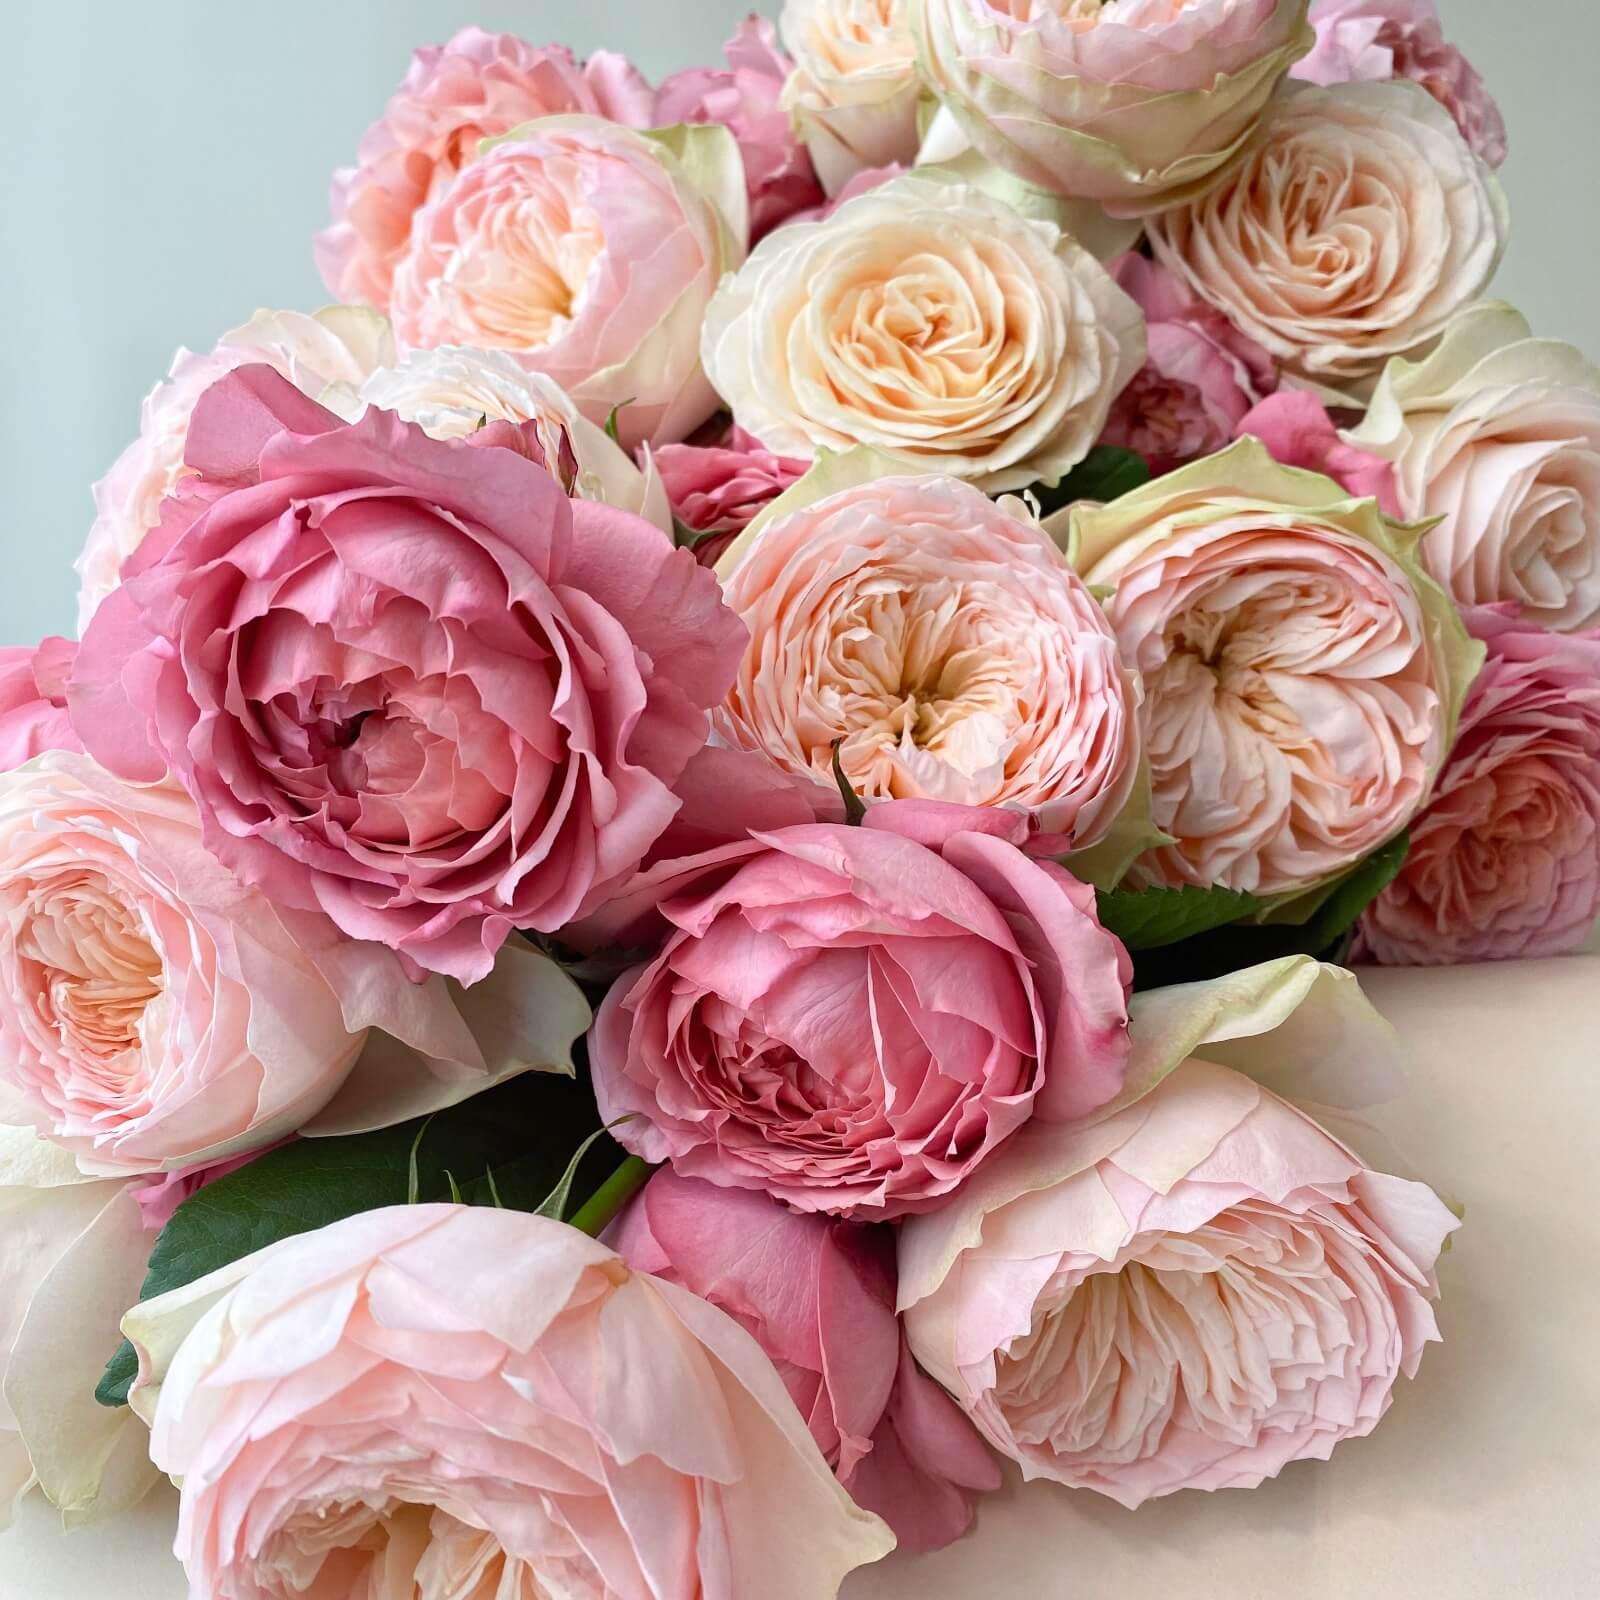 Teeuwen Flowers afbeelding